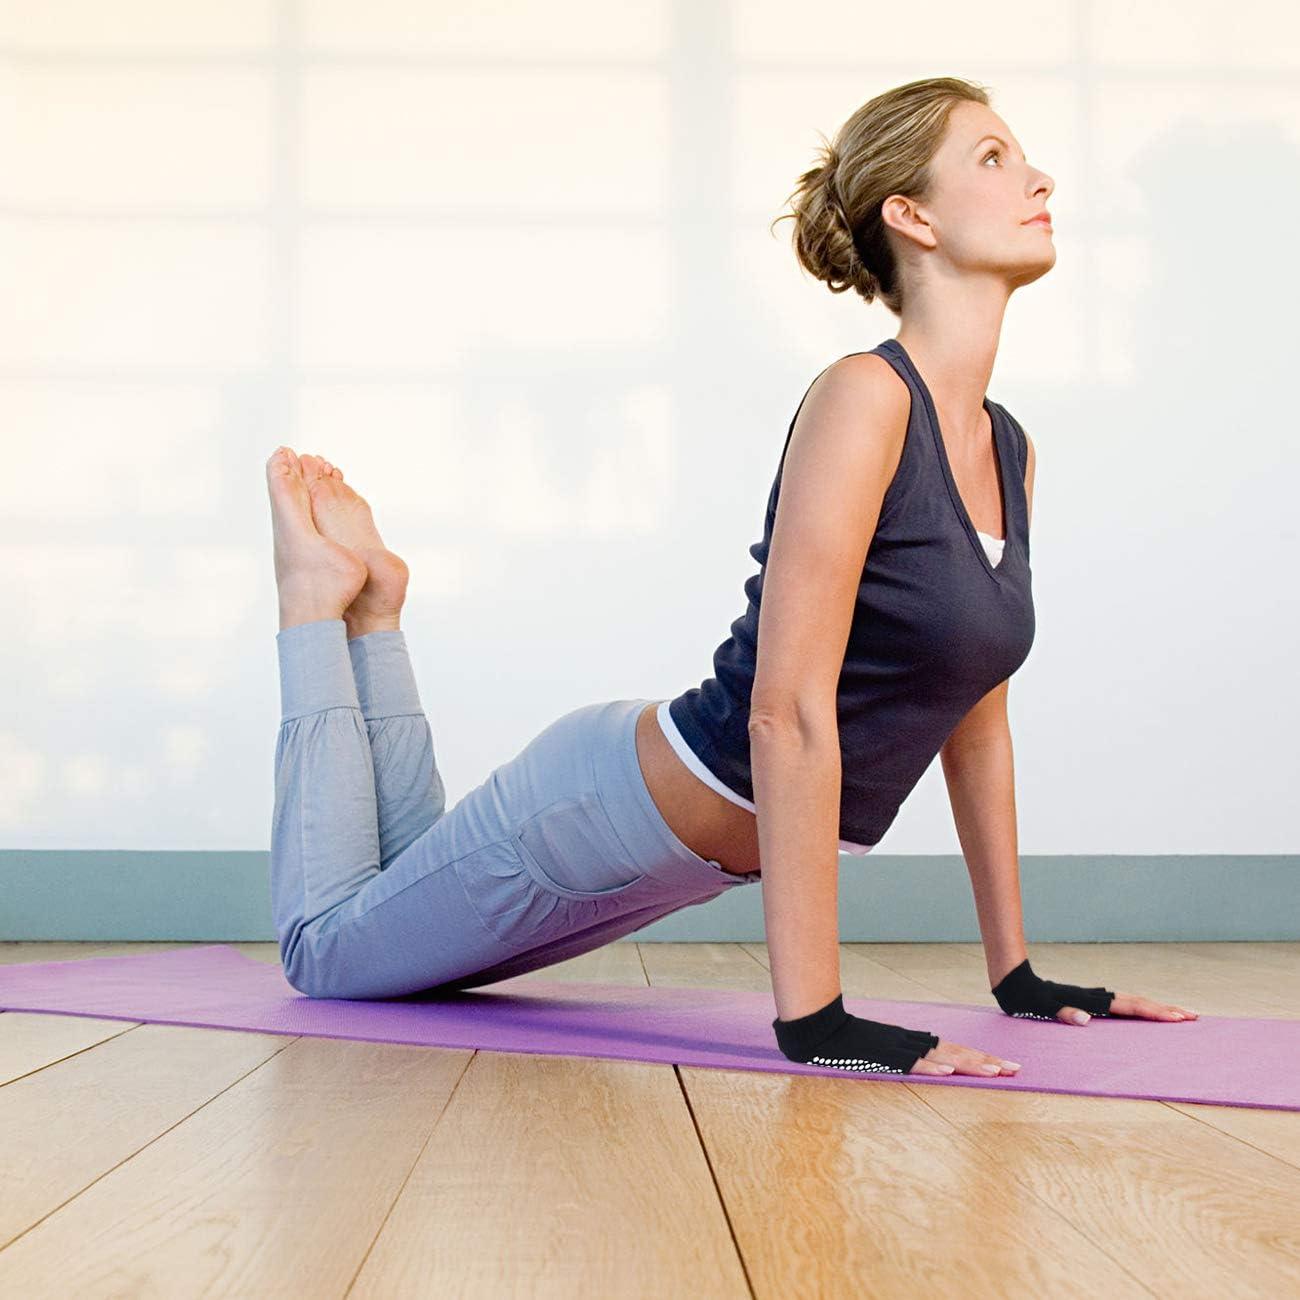 Amazon.com: SUNLAND - Guantes de yoga con agarre ...